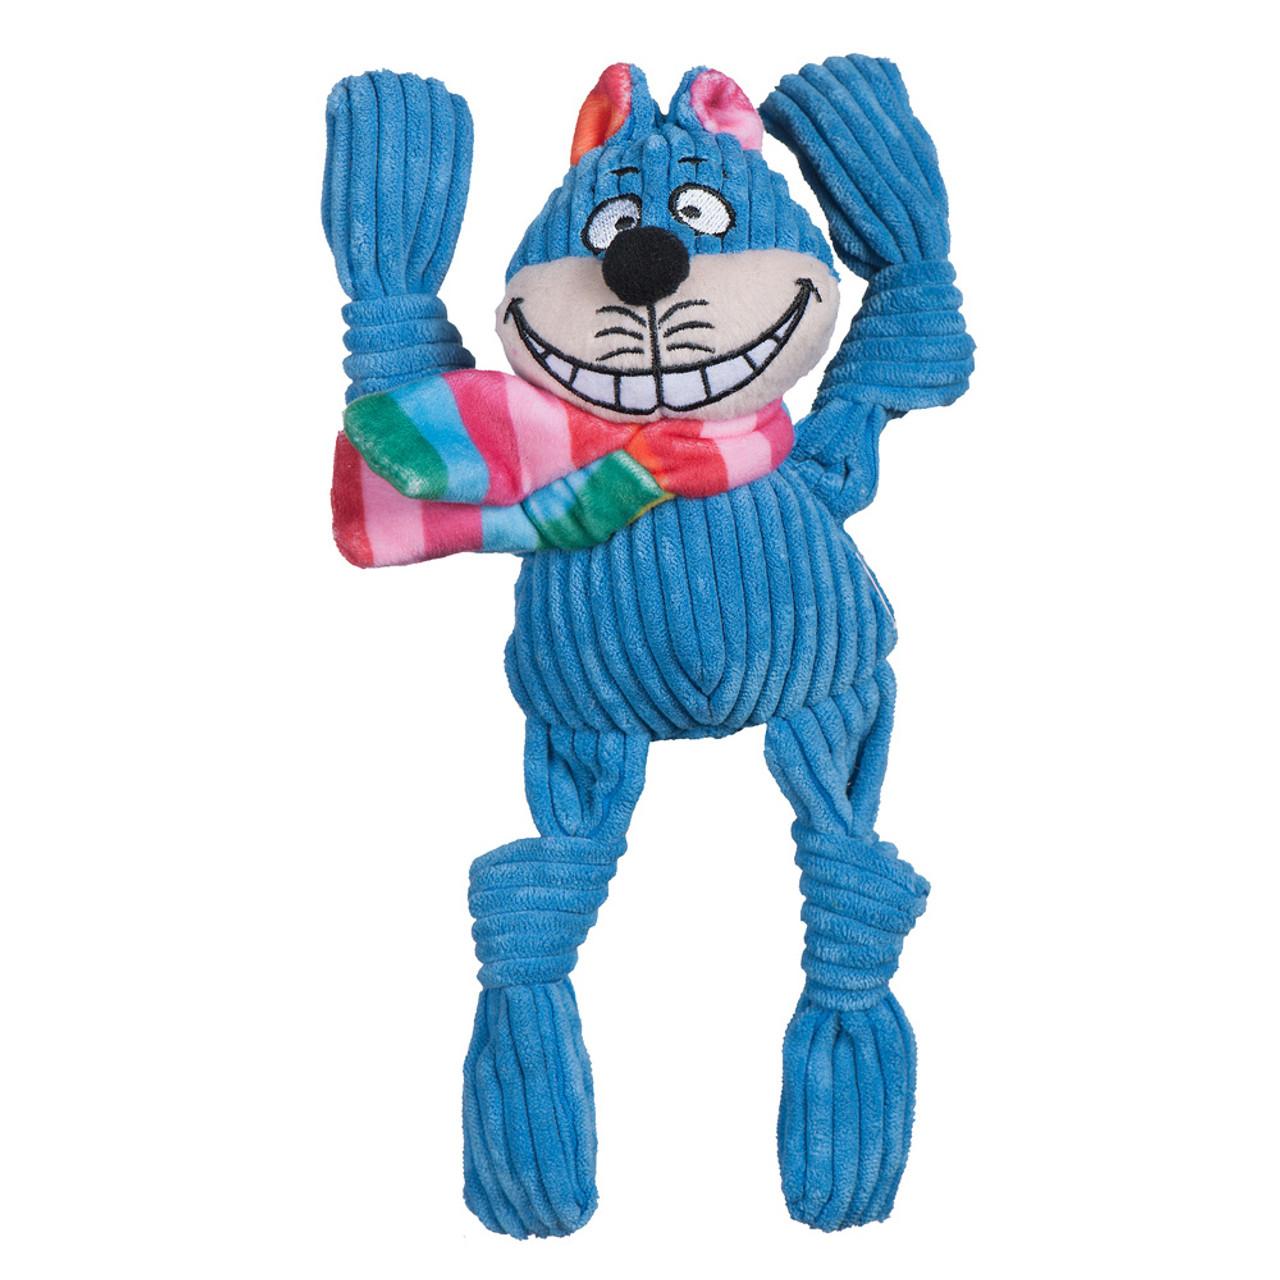 HuggleHounds Knottie Rainbow Cheshire Cat Plush Dog Toy